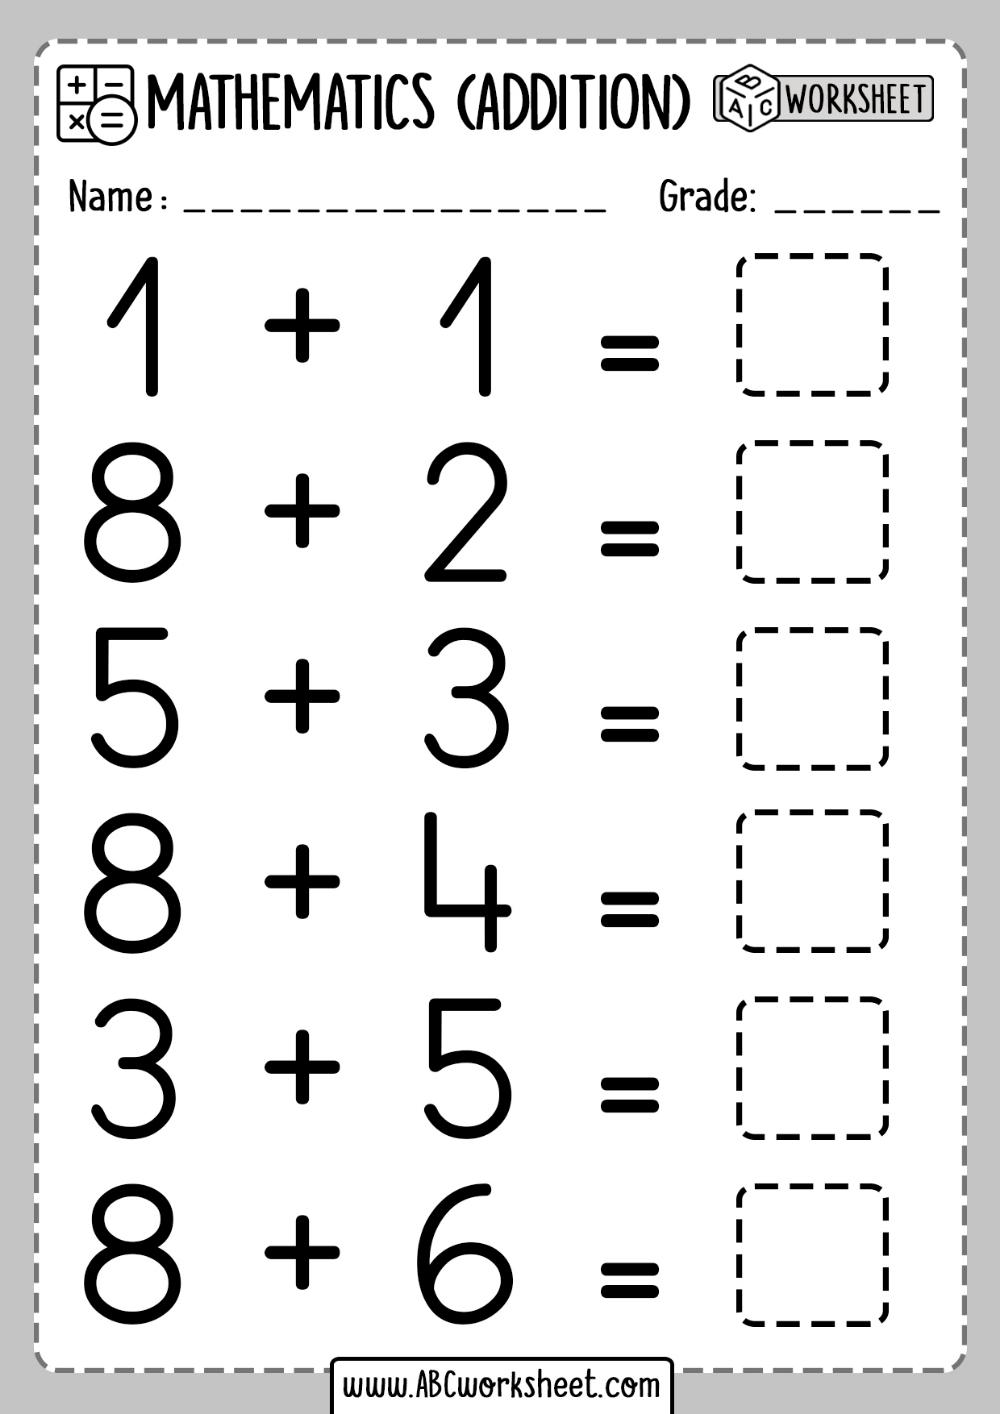 medium resolution of 1st Grade Math Worksheet Addition - ABC Worksheet en 2020